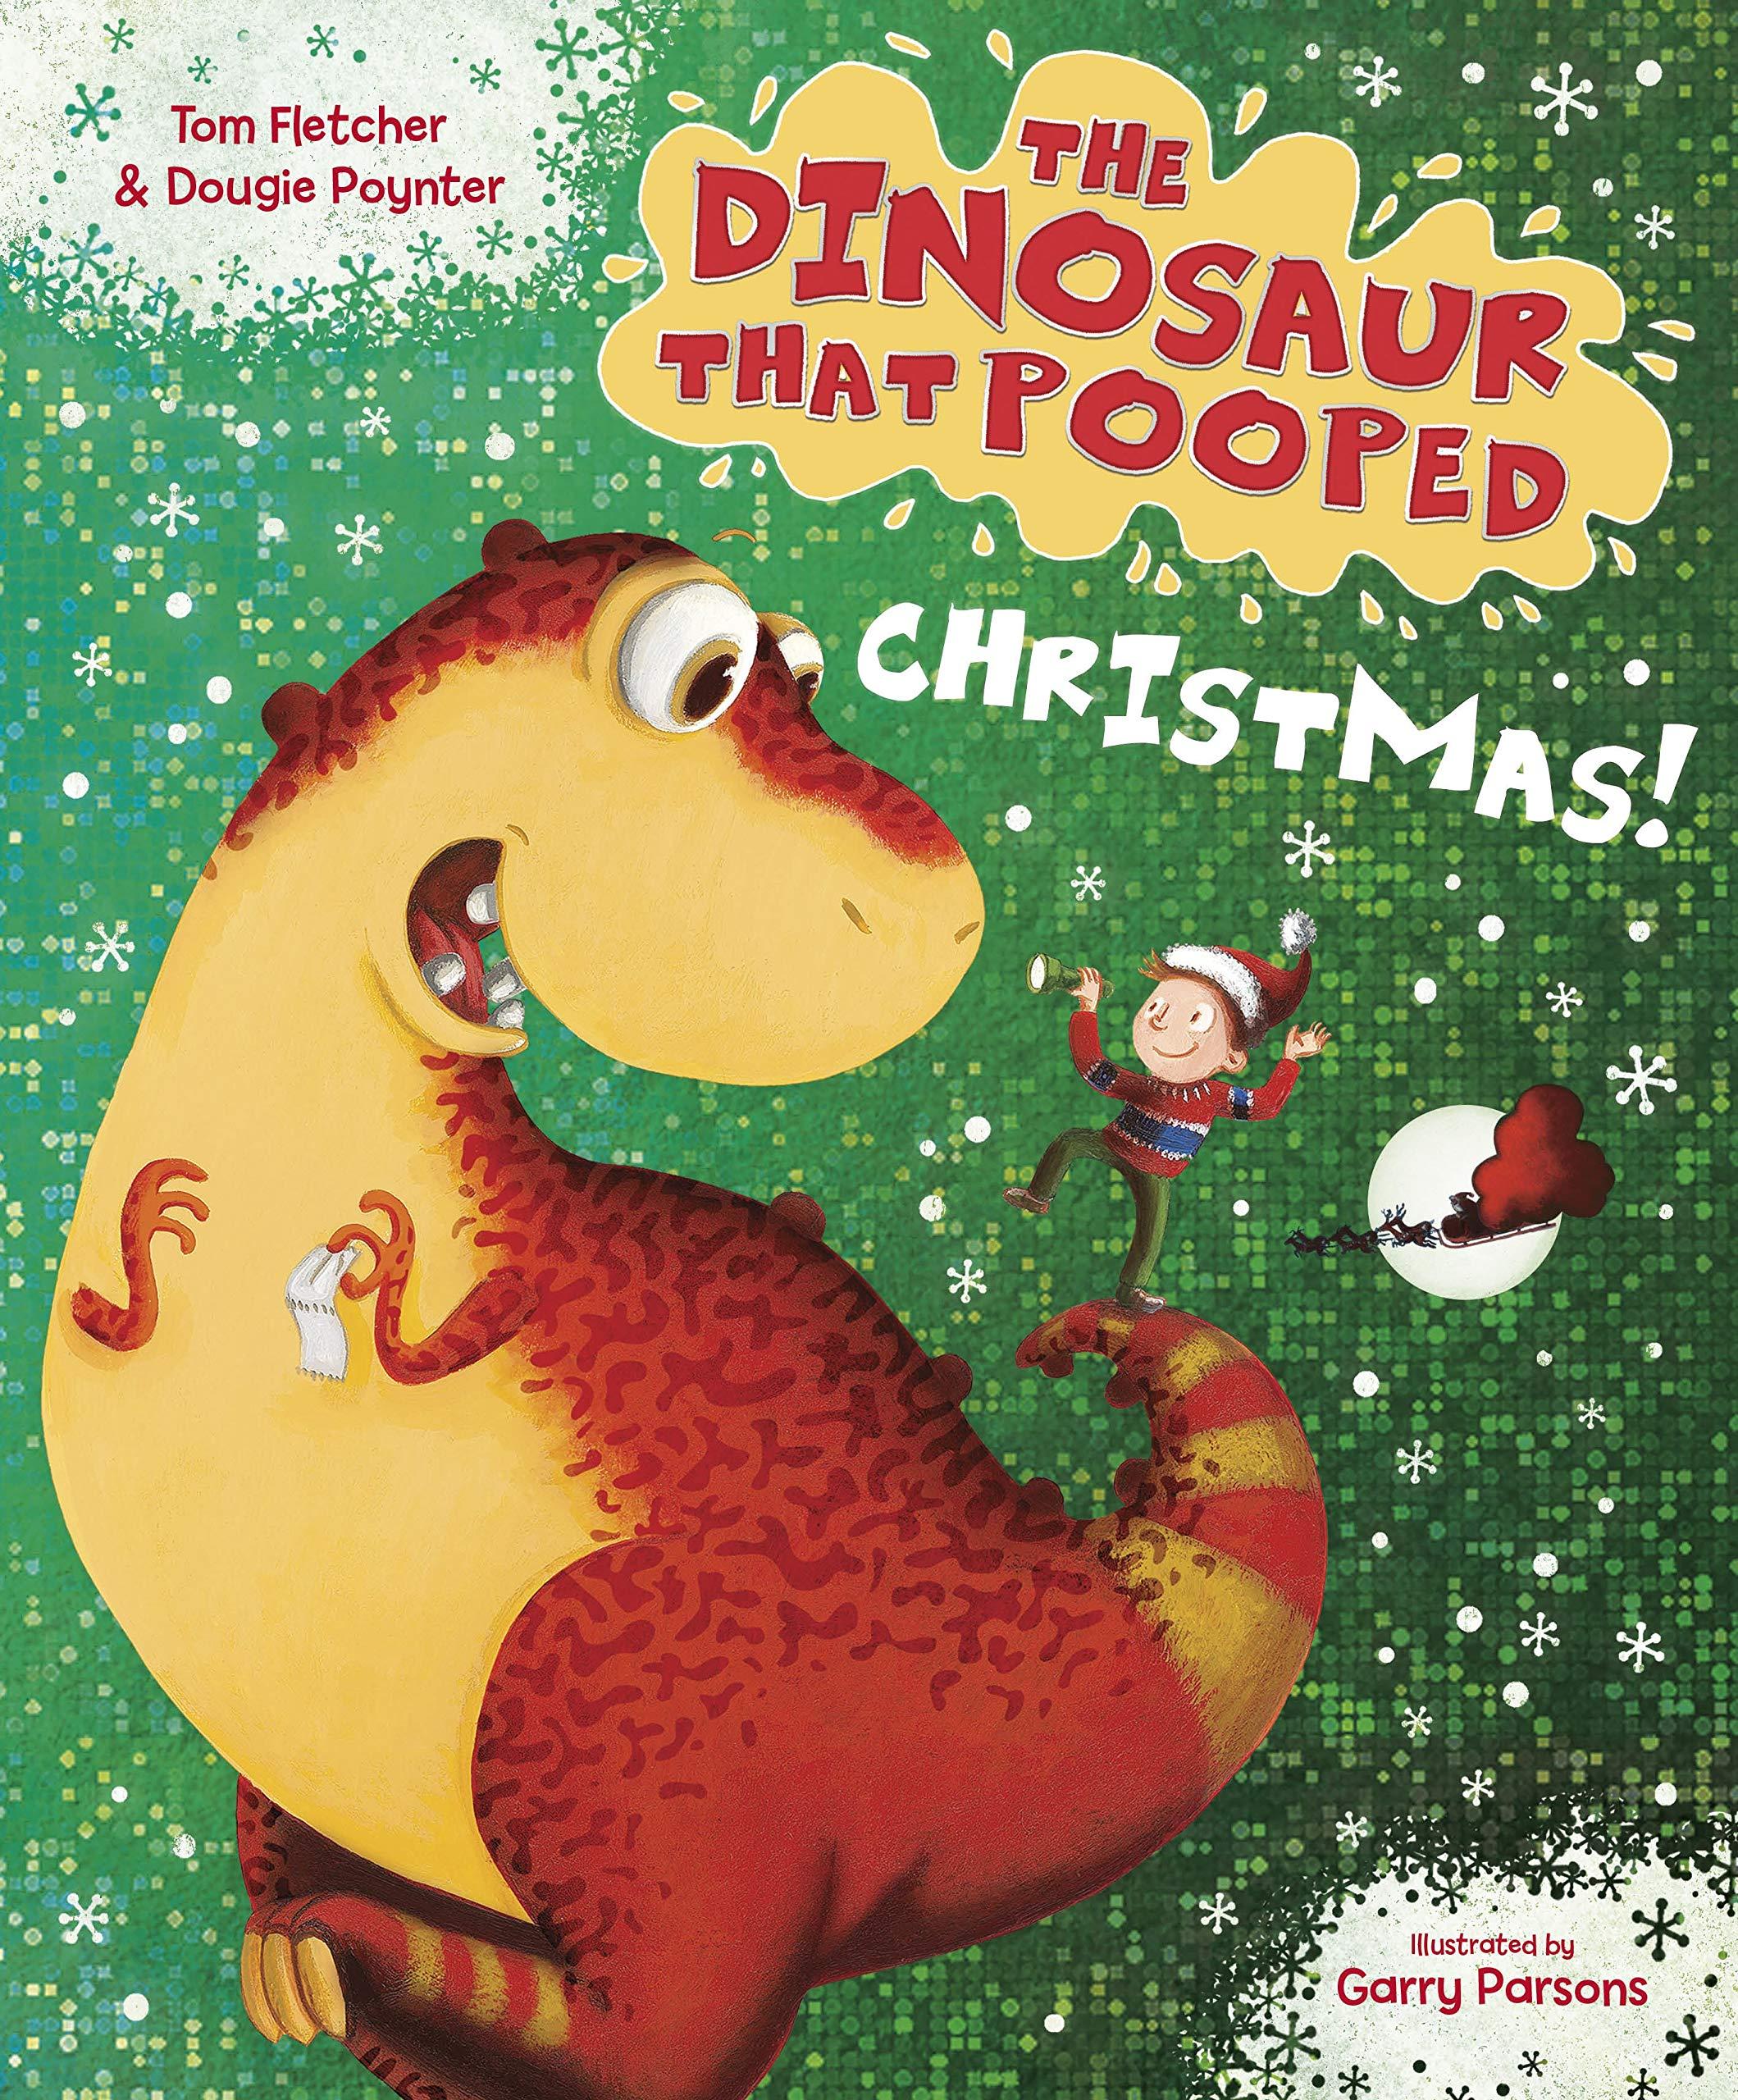 Dinosaur Christmas.The Dinosaur That Pooped Christmas Amazon Co Uk Tom